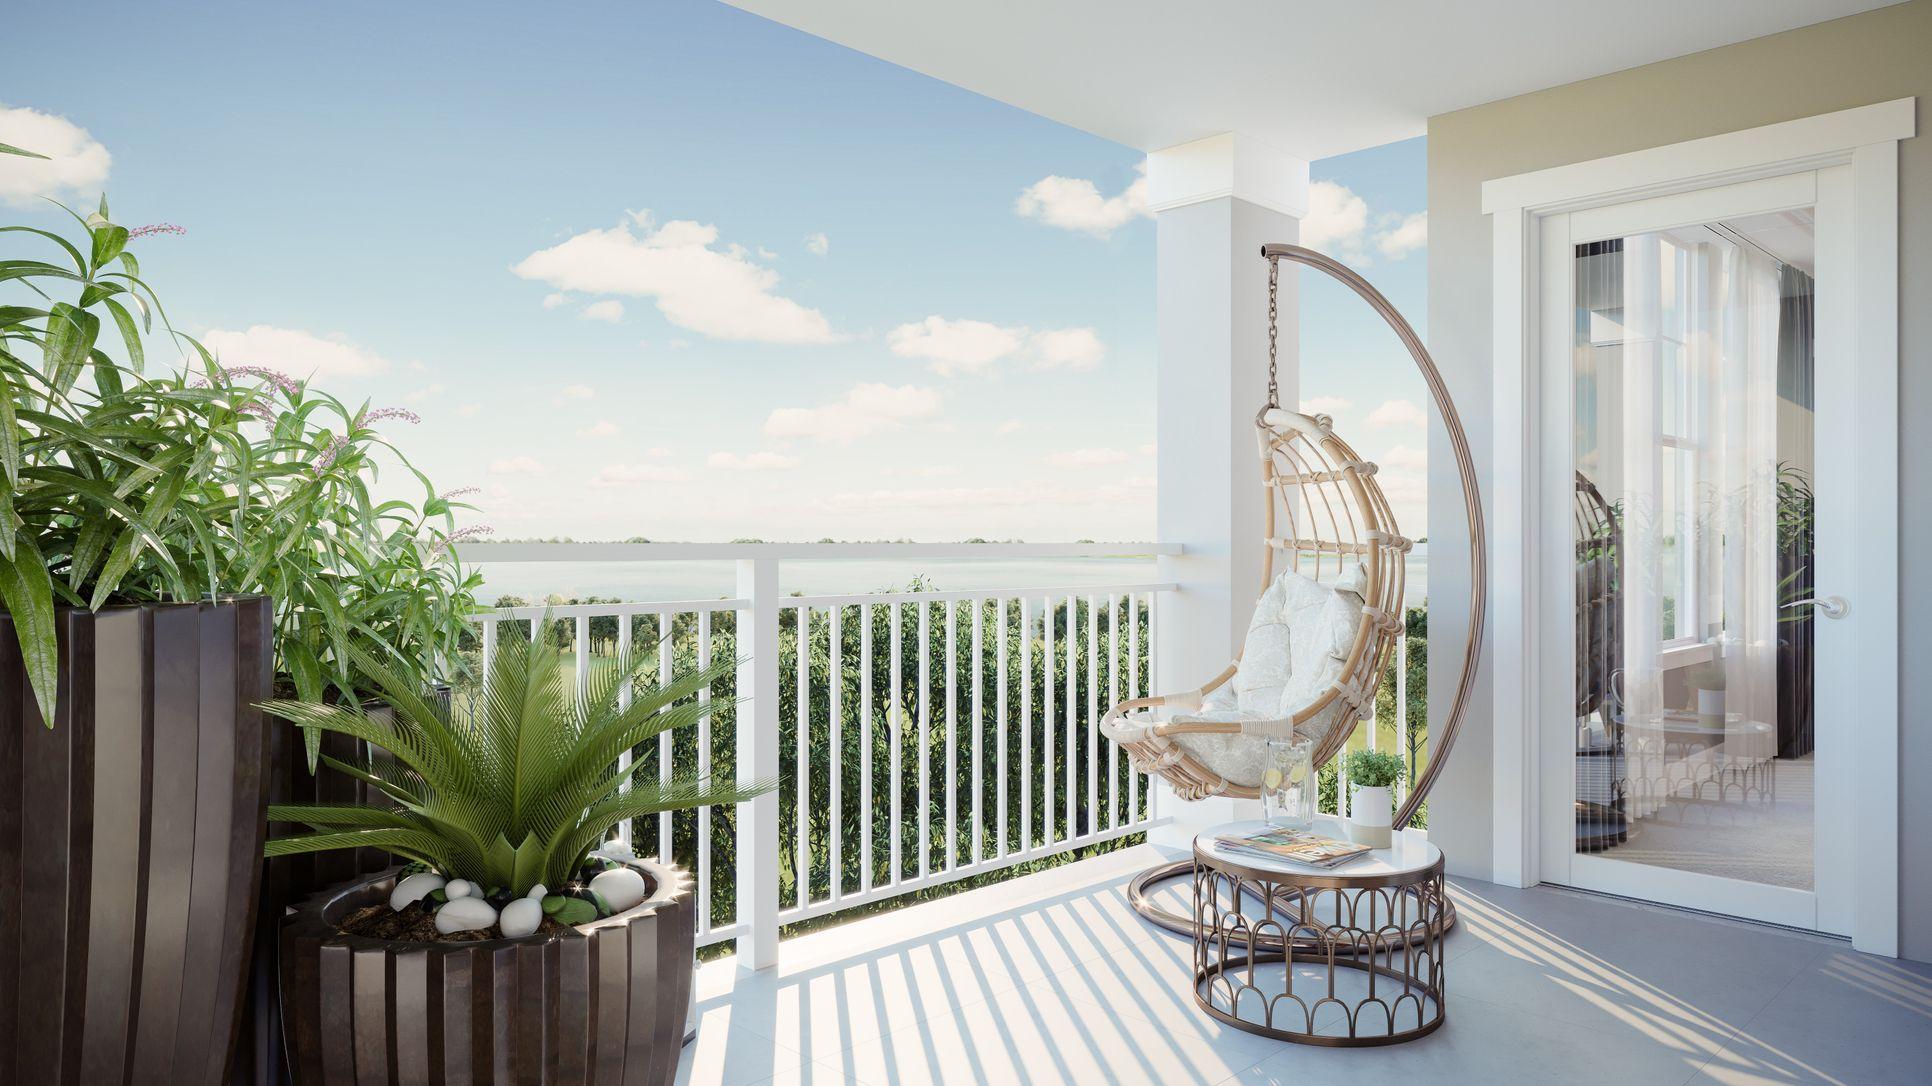 Interior:Spacious balcony